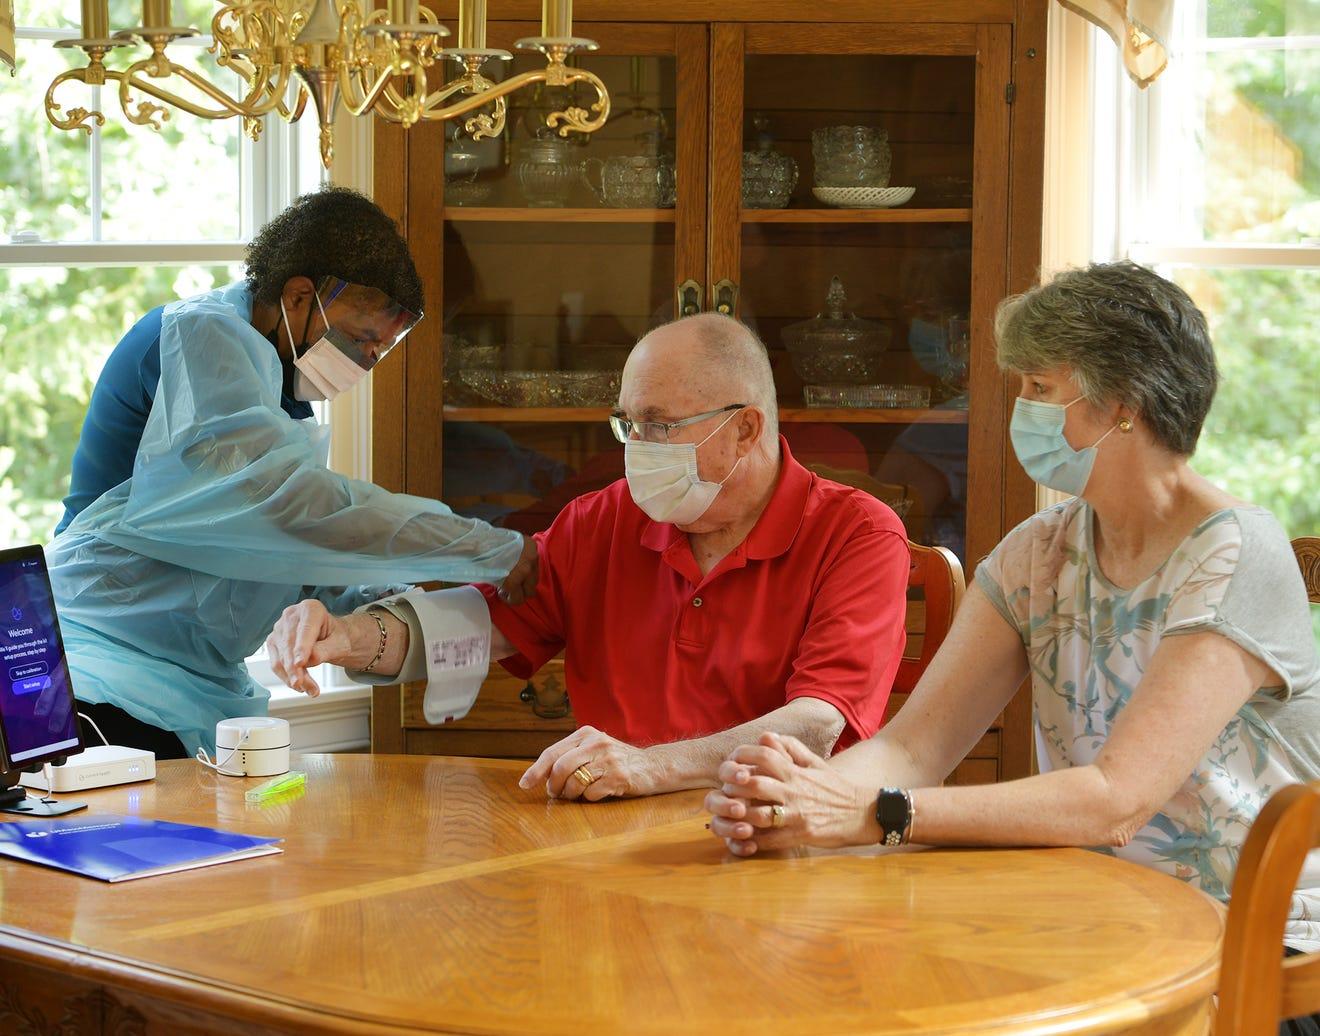 Nurses Lisa DeBoise adjusts the blood pressure cuff on Thad Stappenbeck with his wife Mary beside him. Christine Peterson/Telegram & Gazette